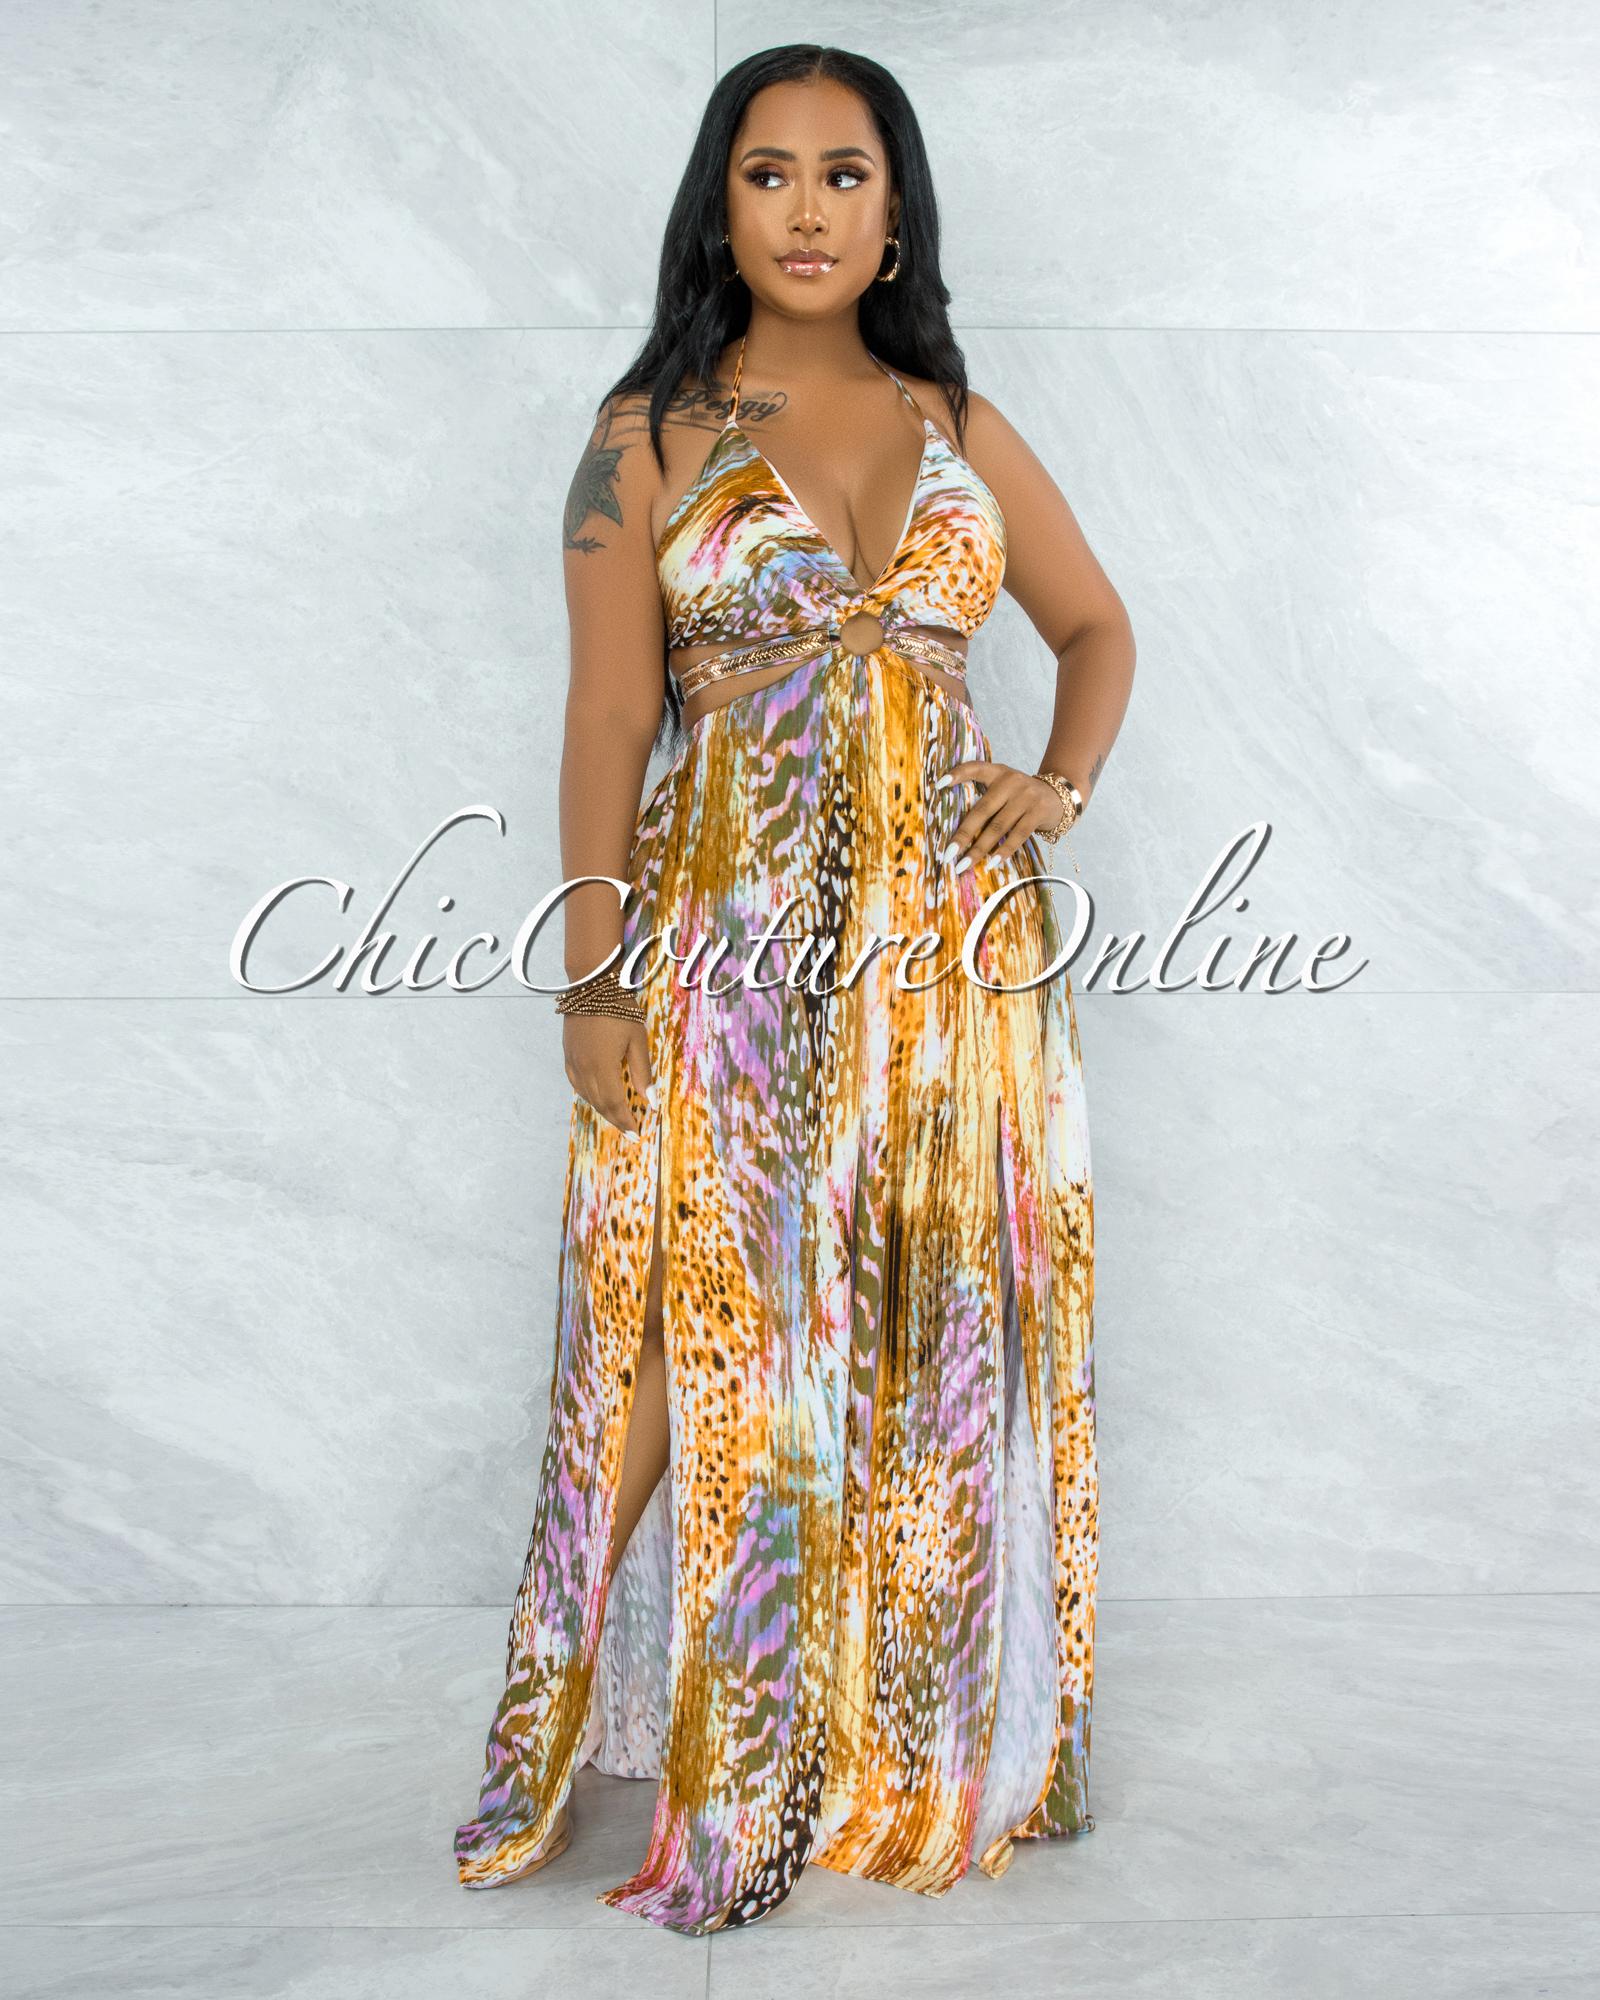 Tiara Brown Pink Print Cut-Out Sides Rhinestones Dress